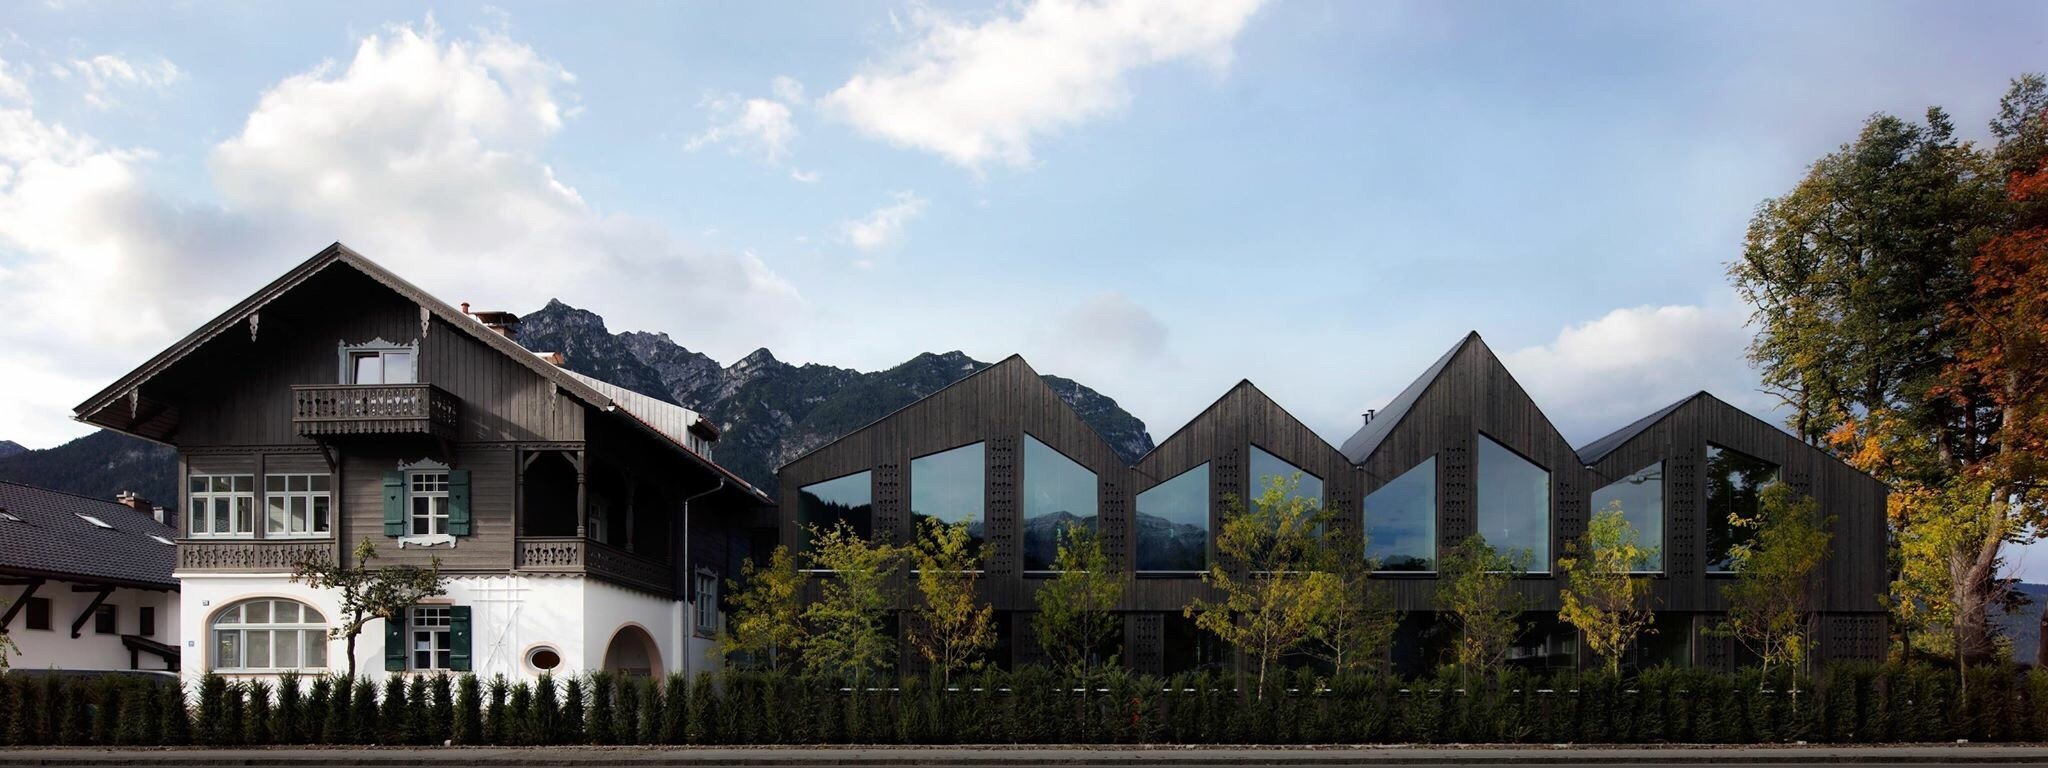 Quartier - Lodges Biohotel